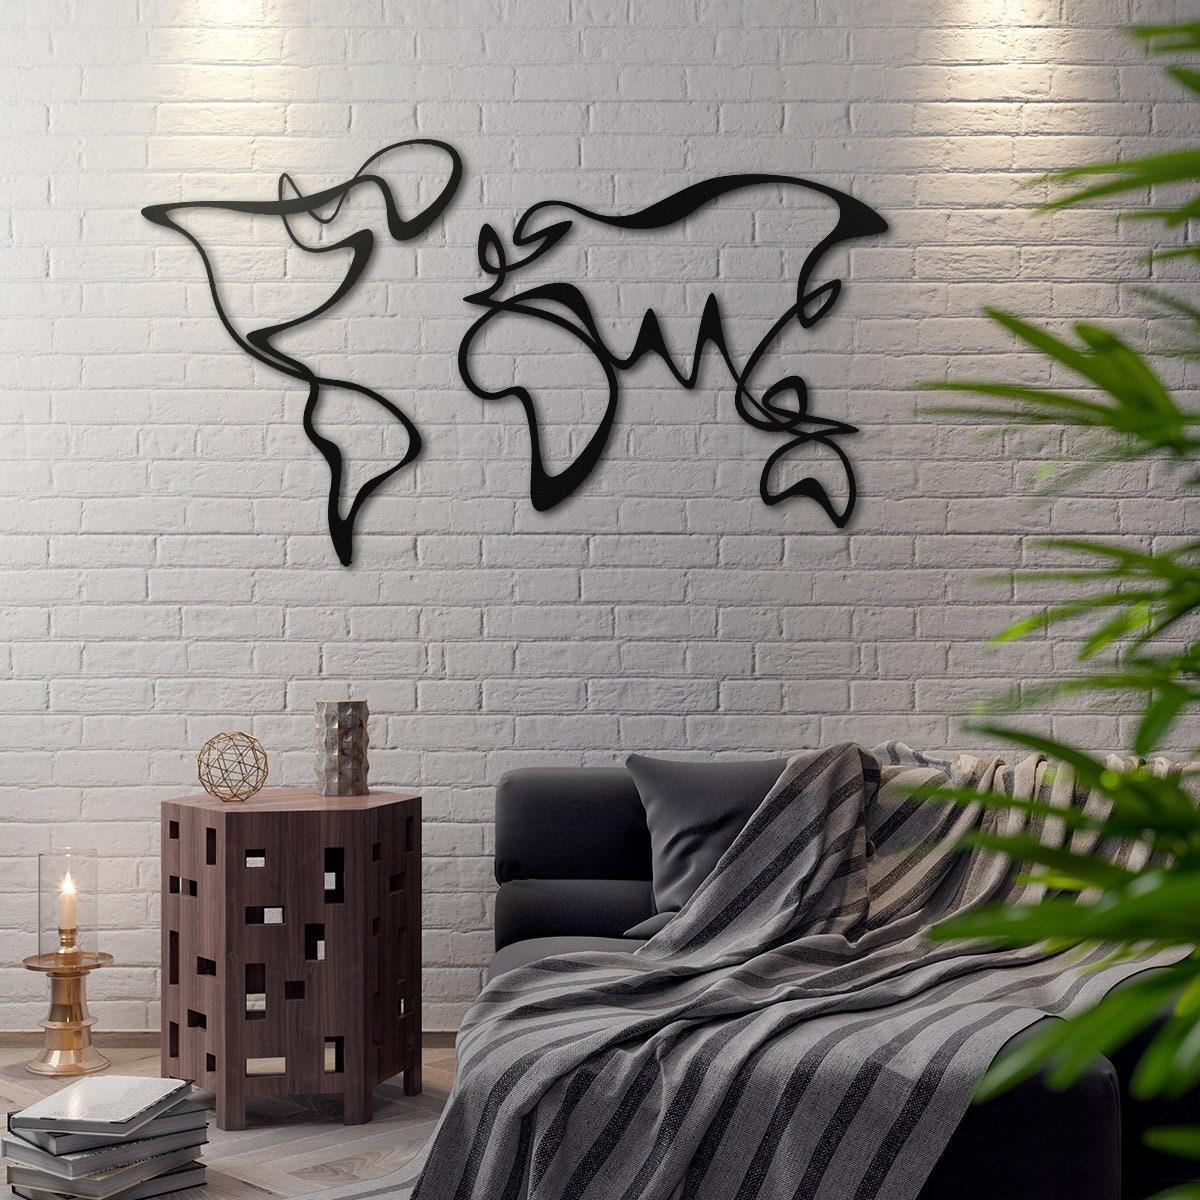 verden carte du monde m tal d coration murale en m tal art etsy. Black Bedroom Furniture Sets. Home Design Ideas